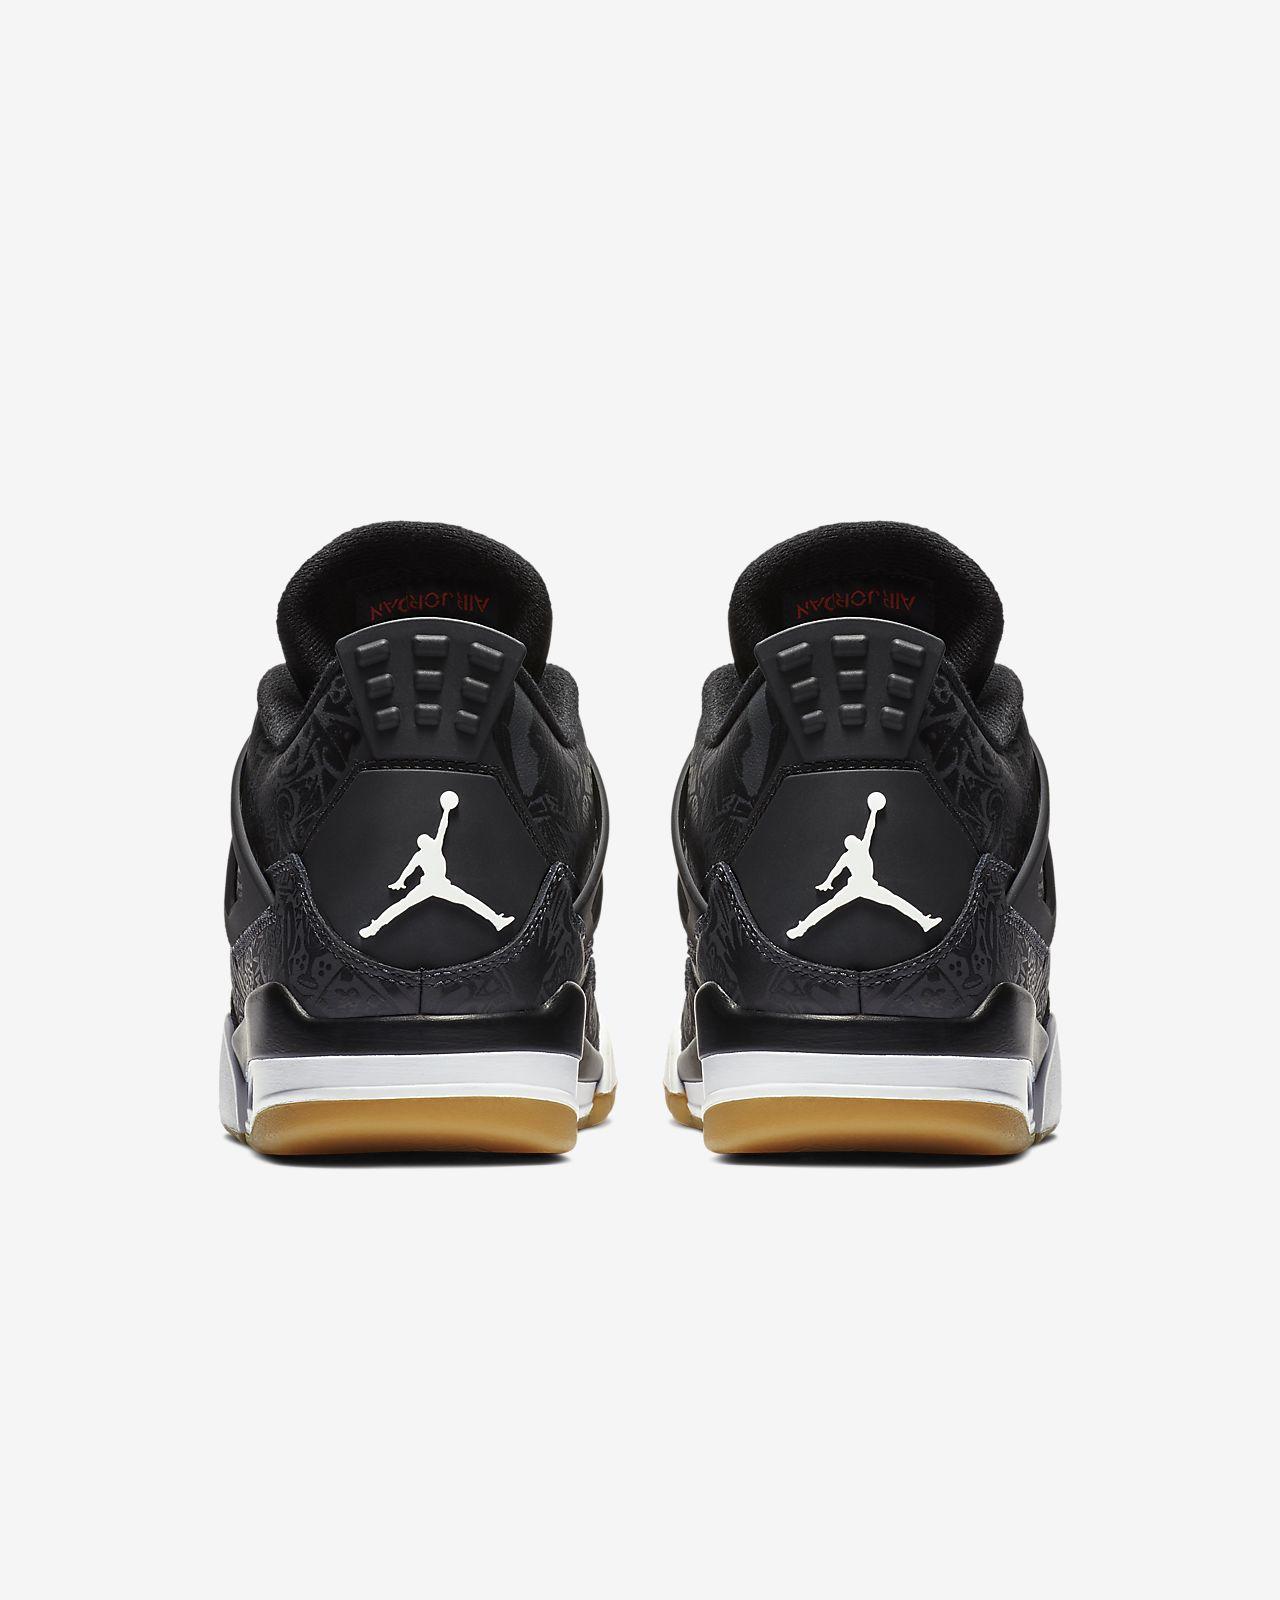 6adcfb081 Air Jordan 4 Retro SE Men's Shoe. Nike.com MY